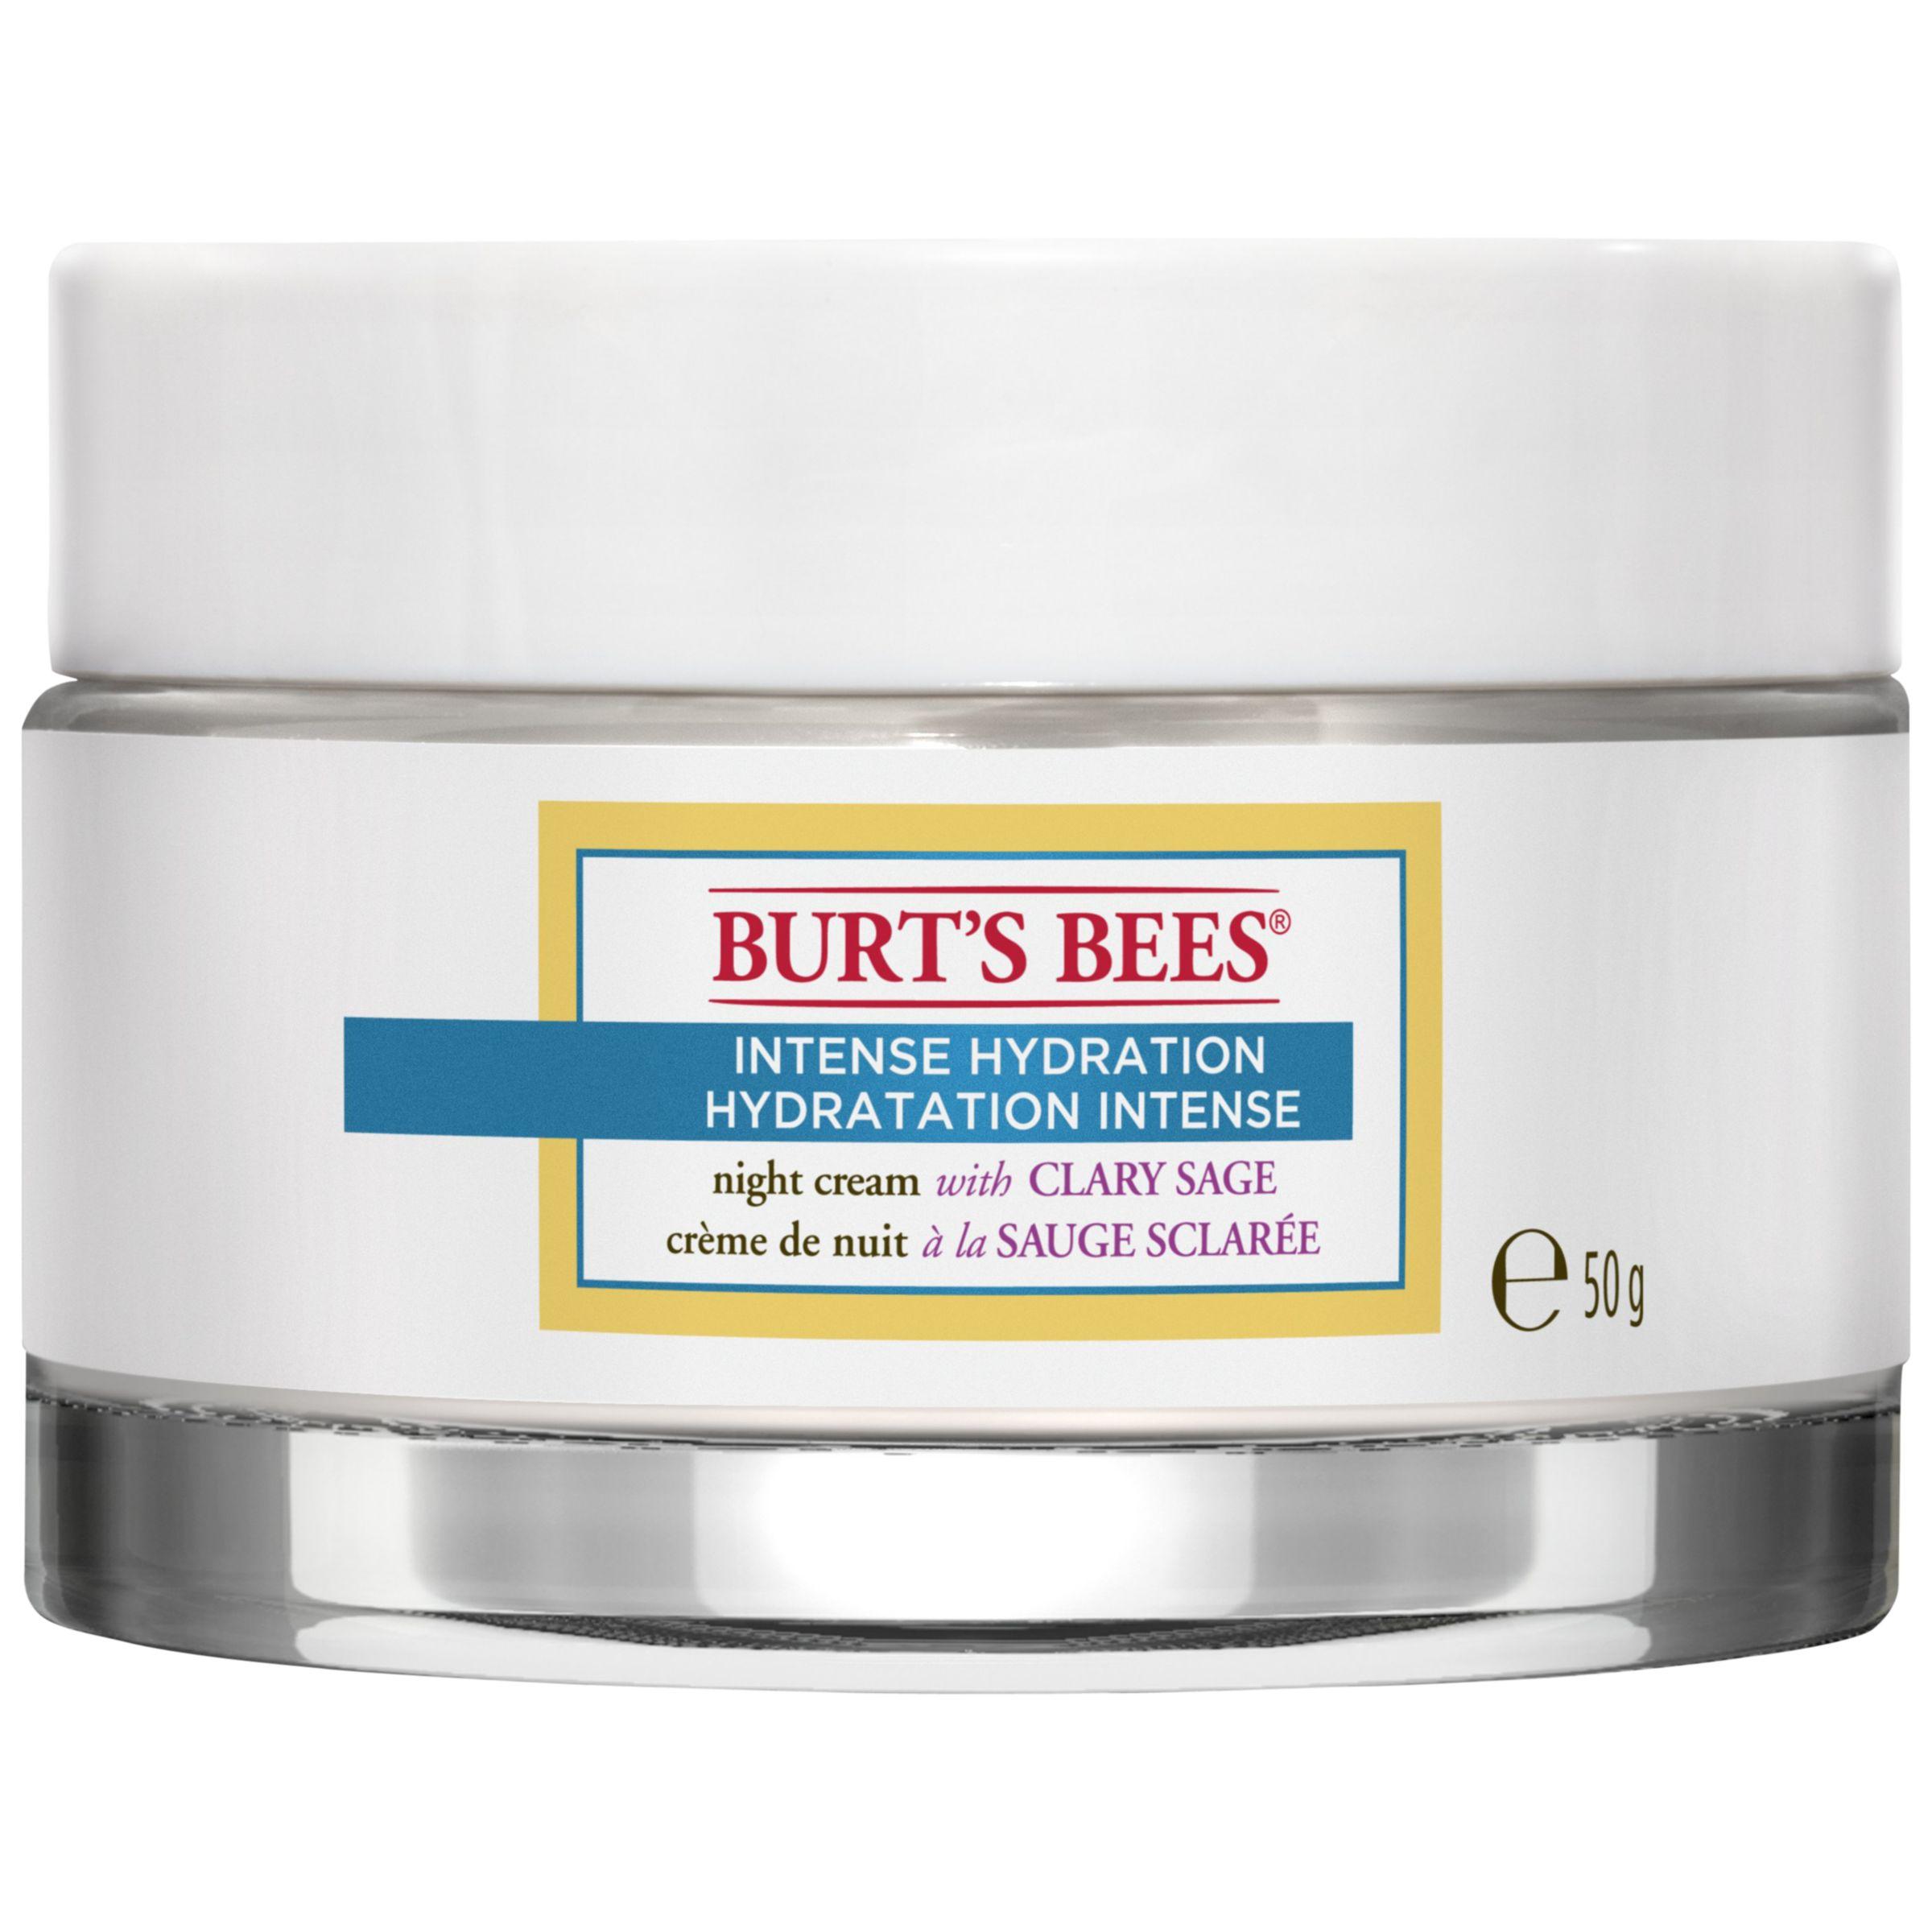 Burt S Bees Intense Hydration Night Cream 50g At John Lewis Partners